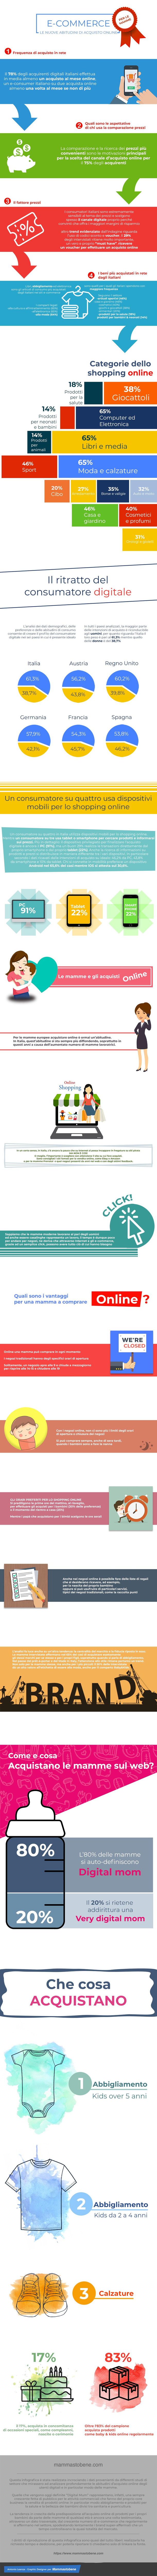 infografica msb